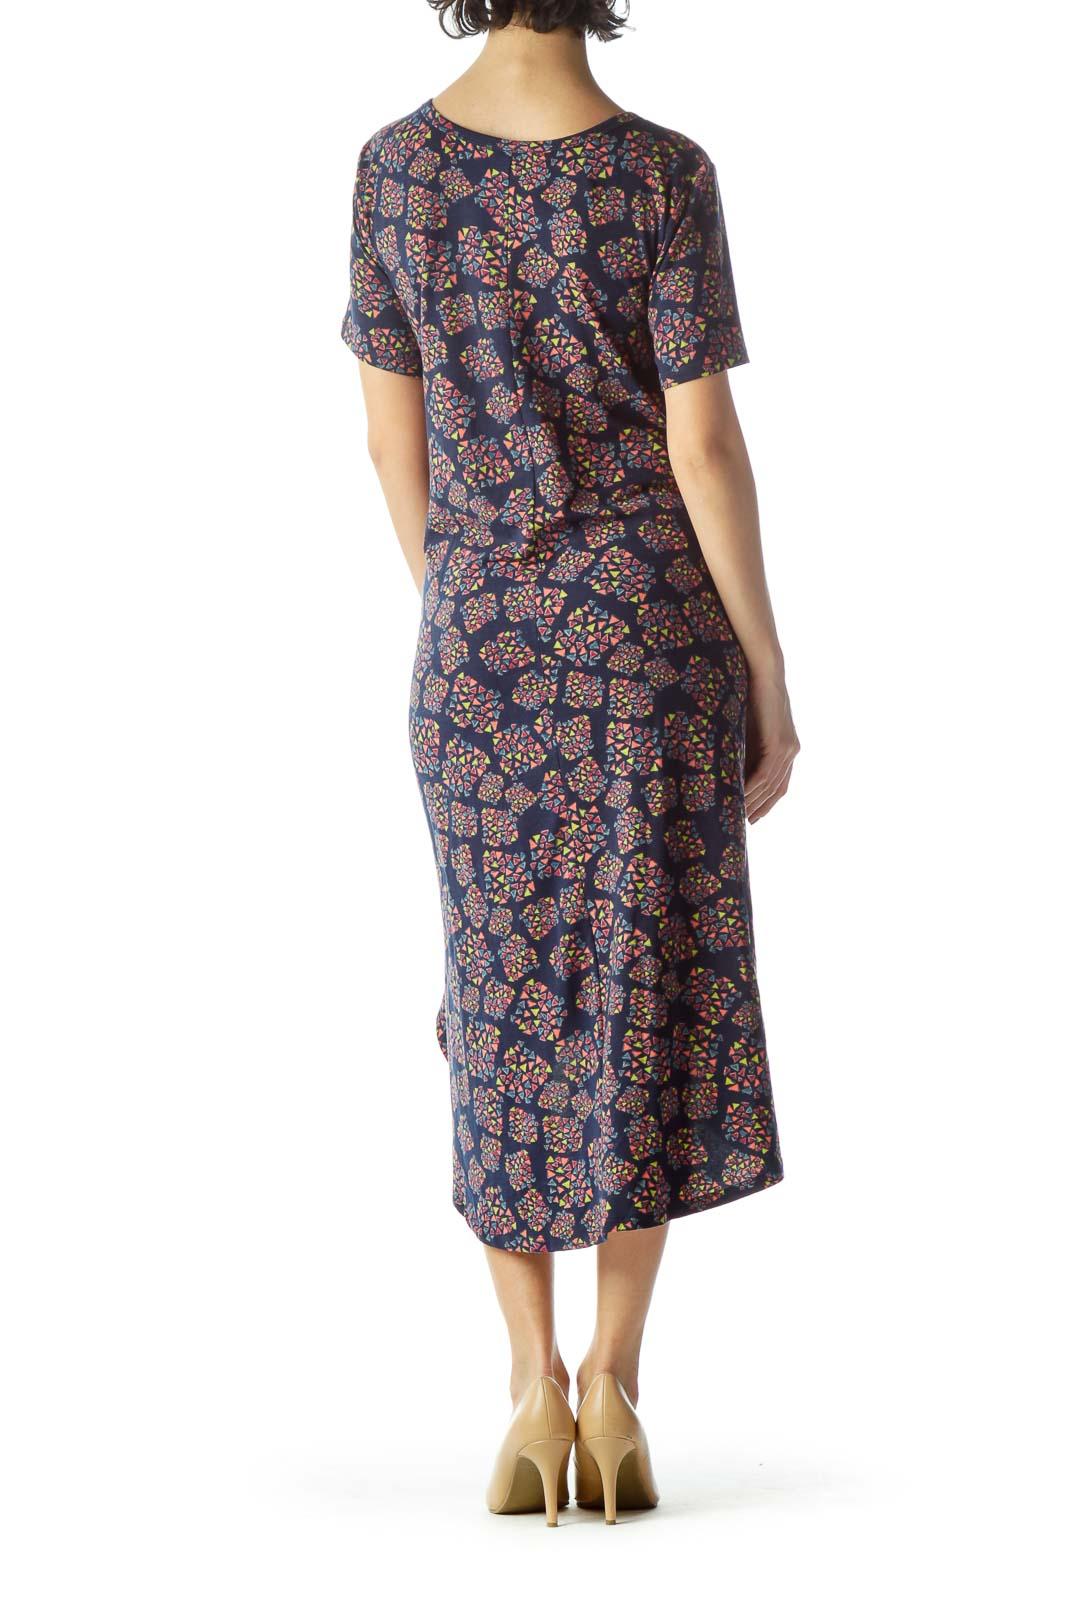 Multicolored Geometric Print Jersey-Knit Dress